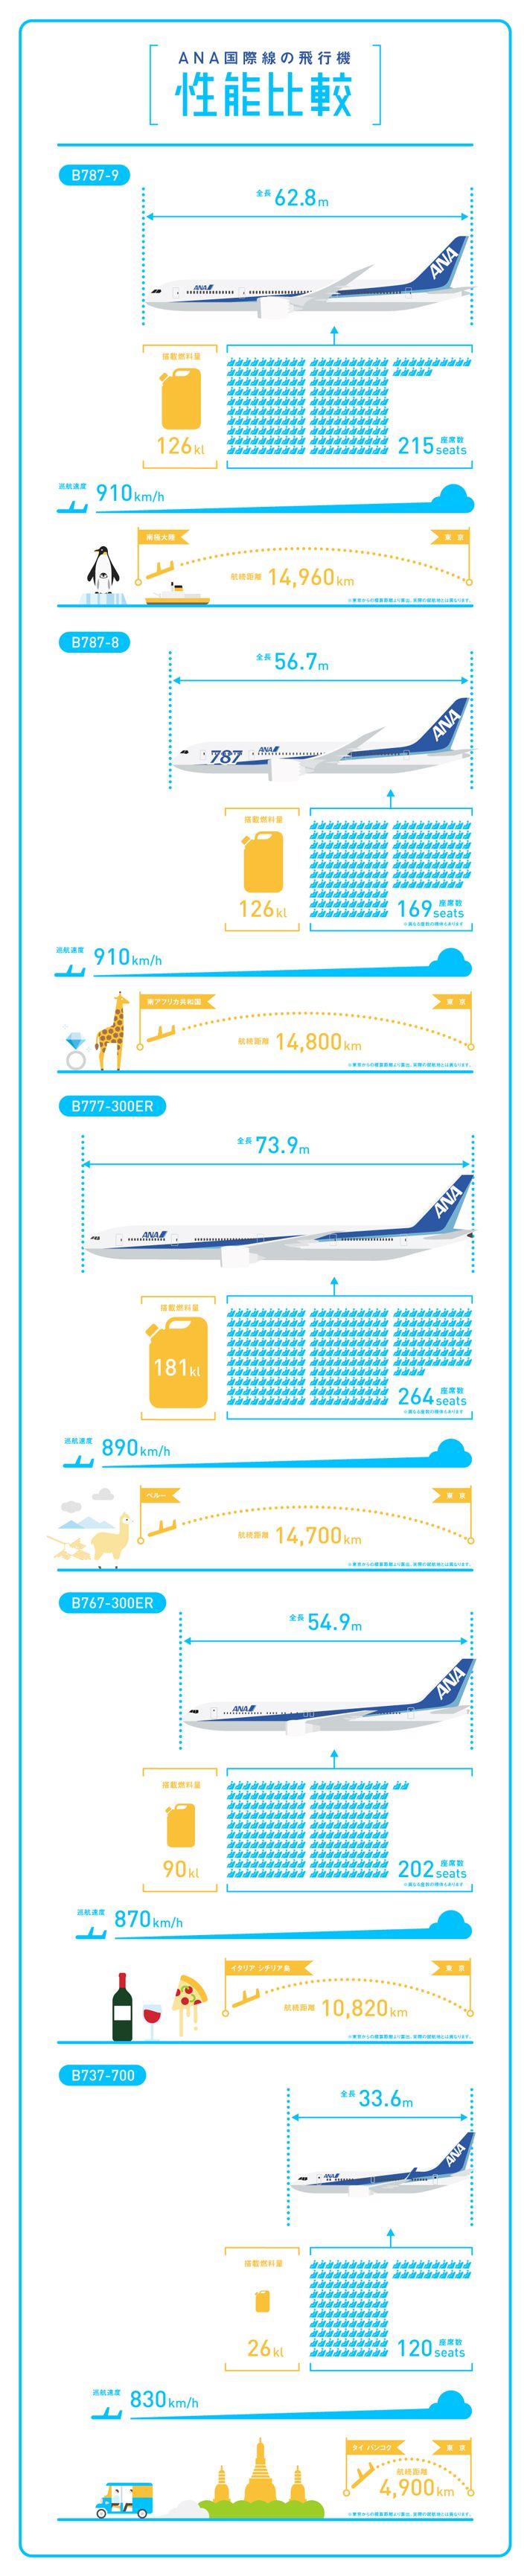 Airplane performance comparison of ANA international flights